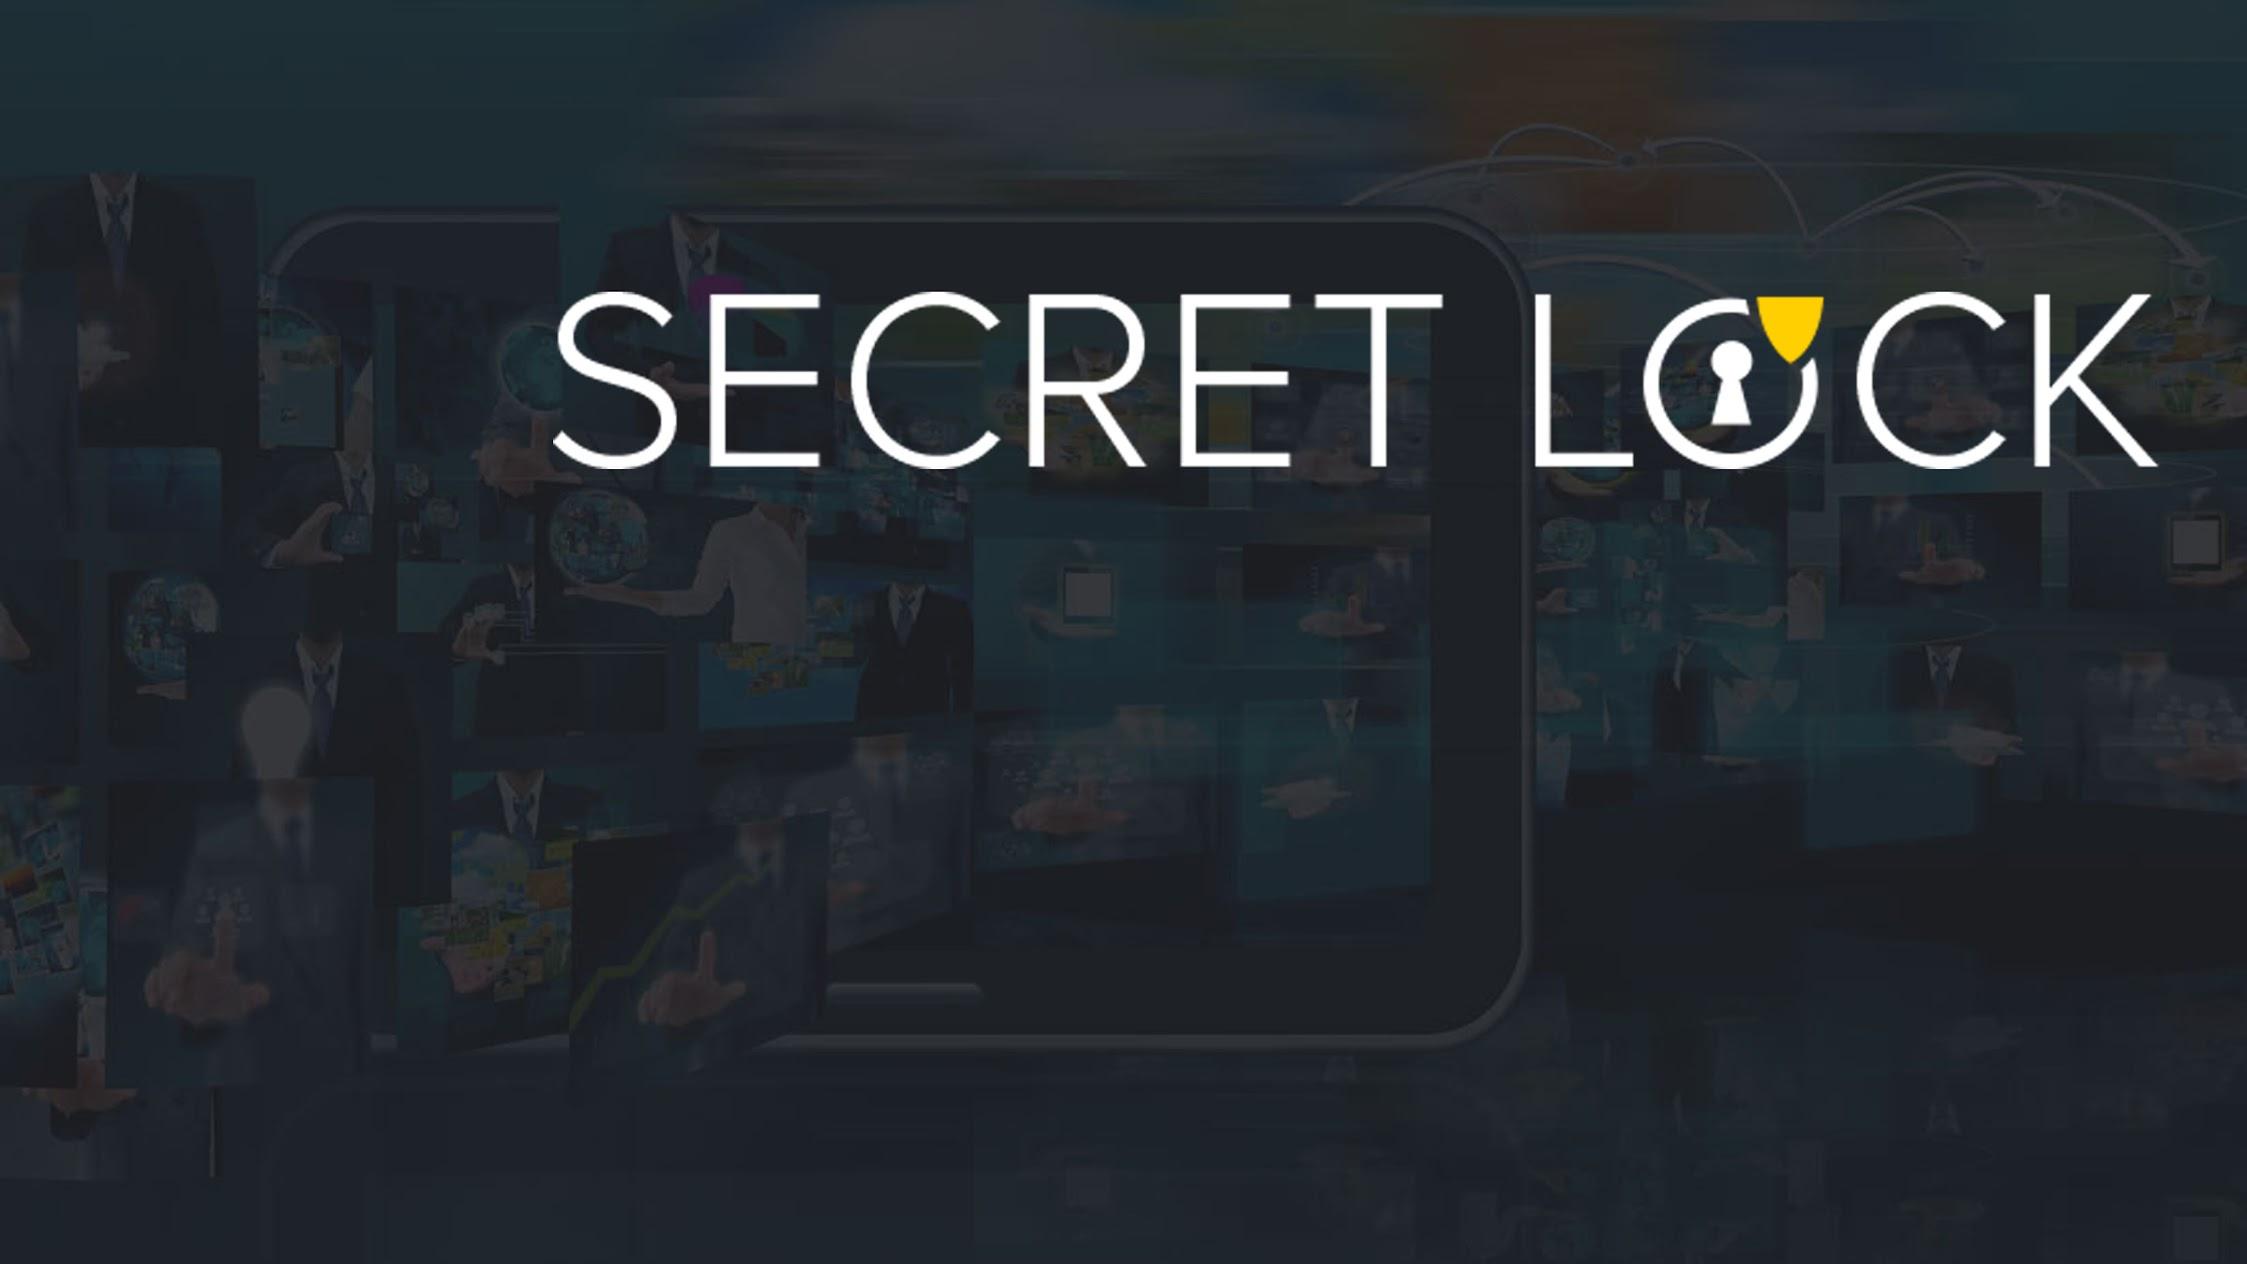 secretapplock